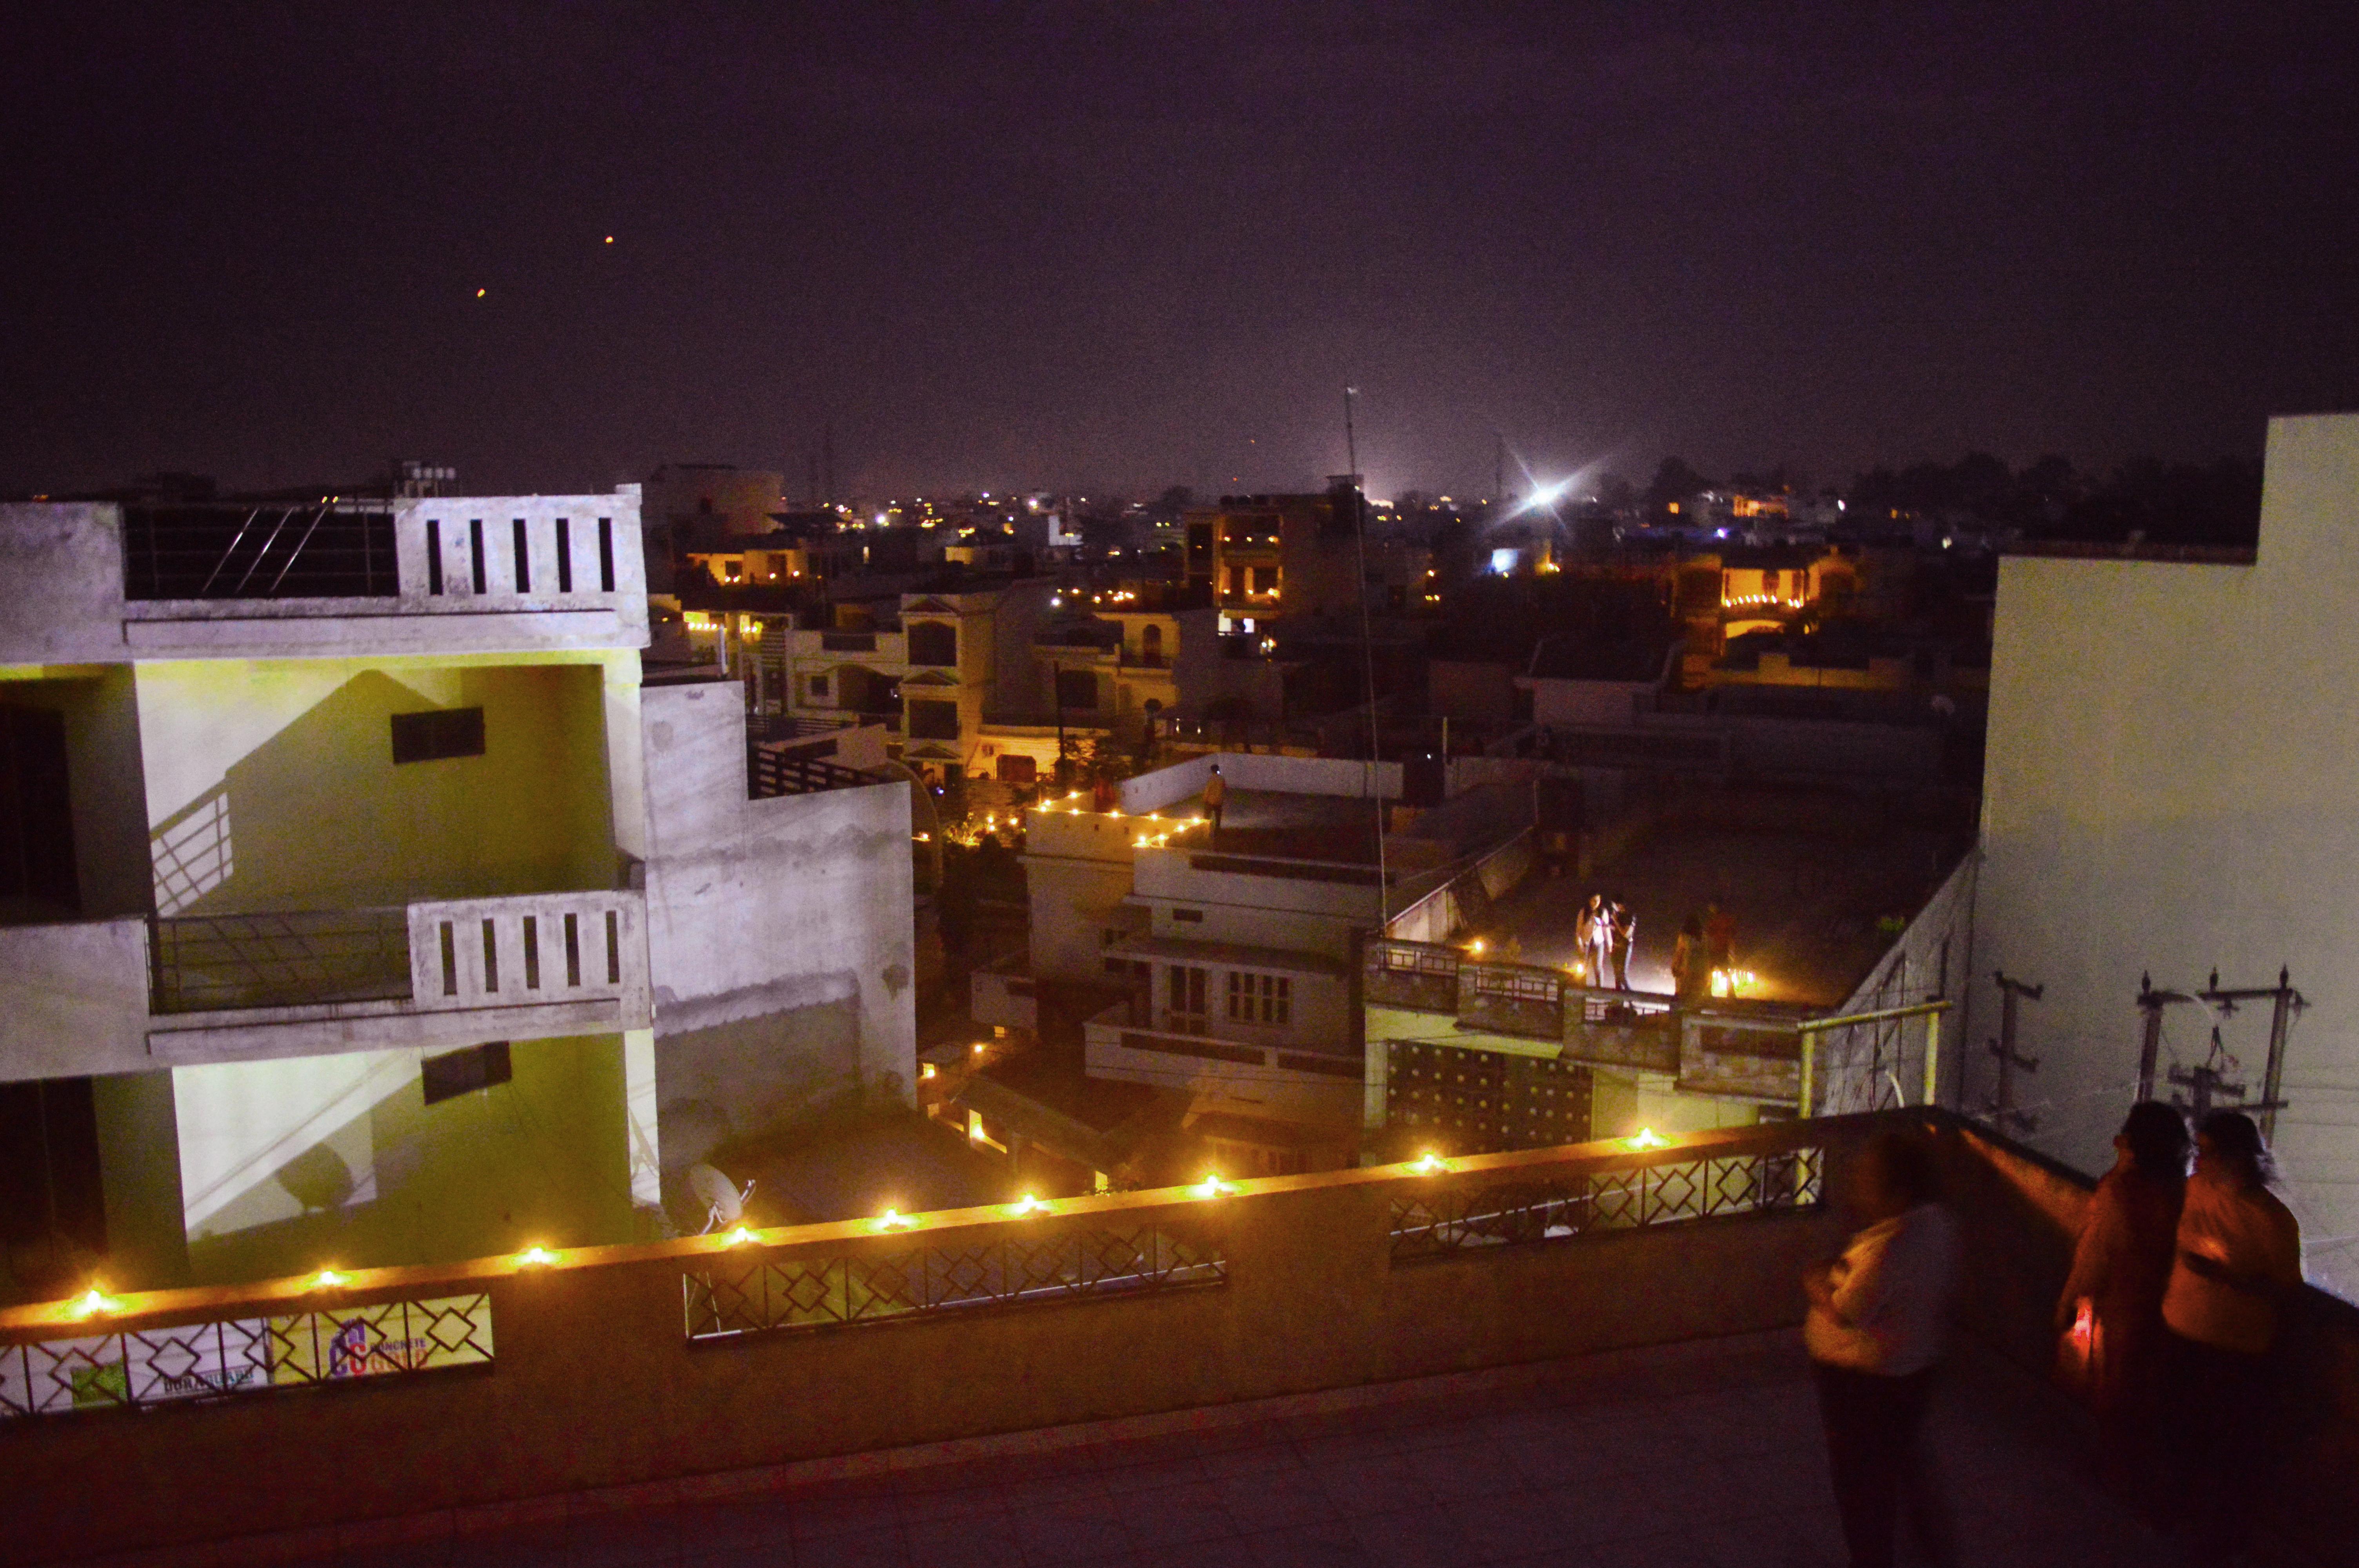 corona_covid_9baje-9minute_India_lockdown_Desh_Bharat_diya_candle_lamp_light_painting_nikon_d3200